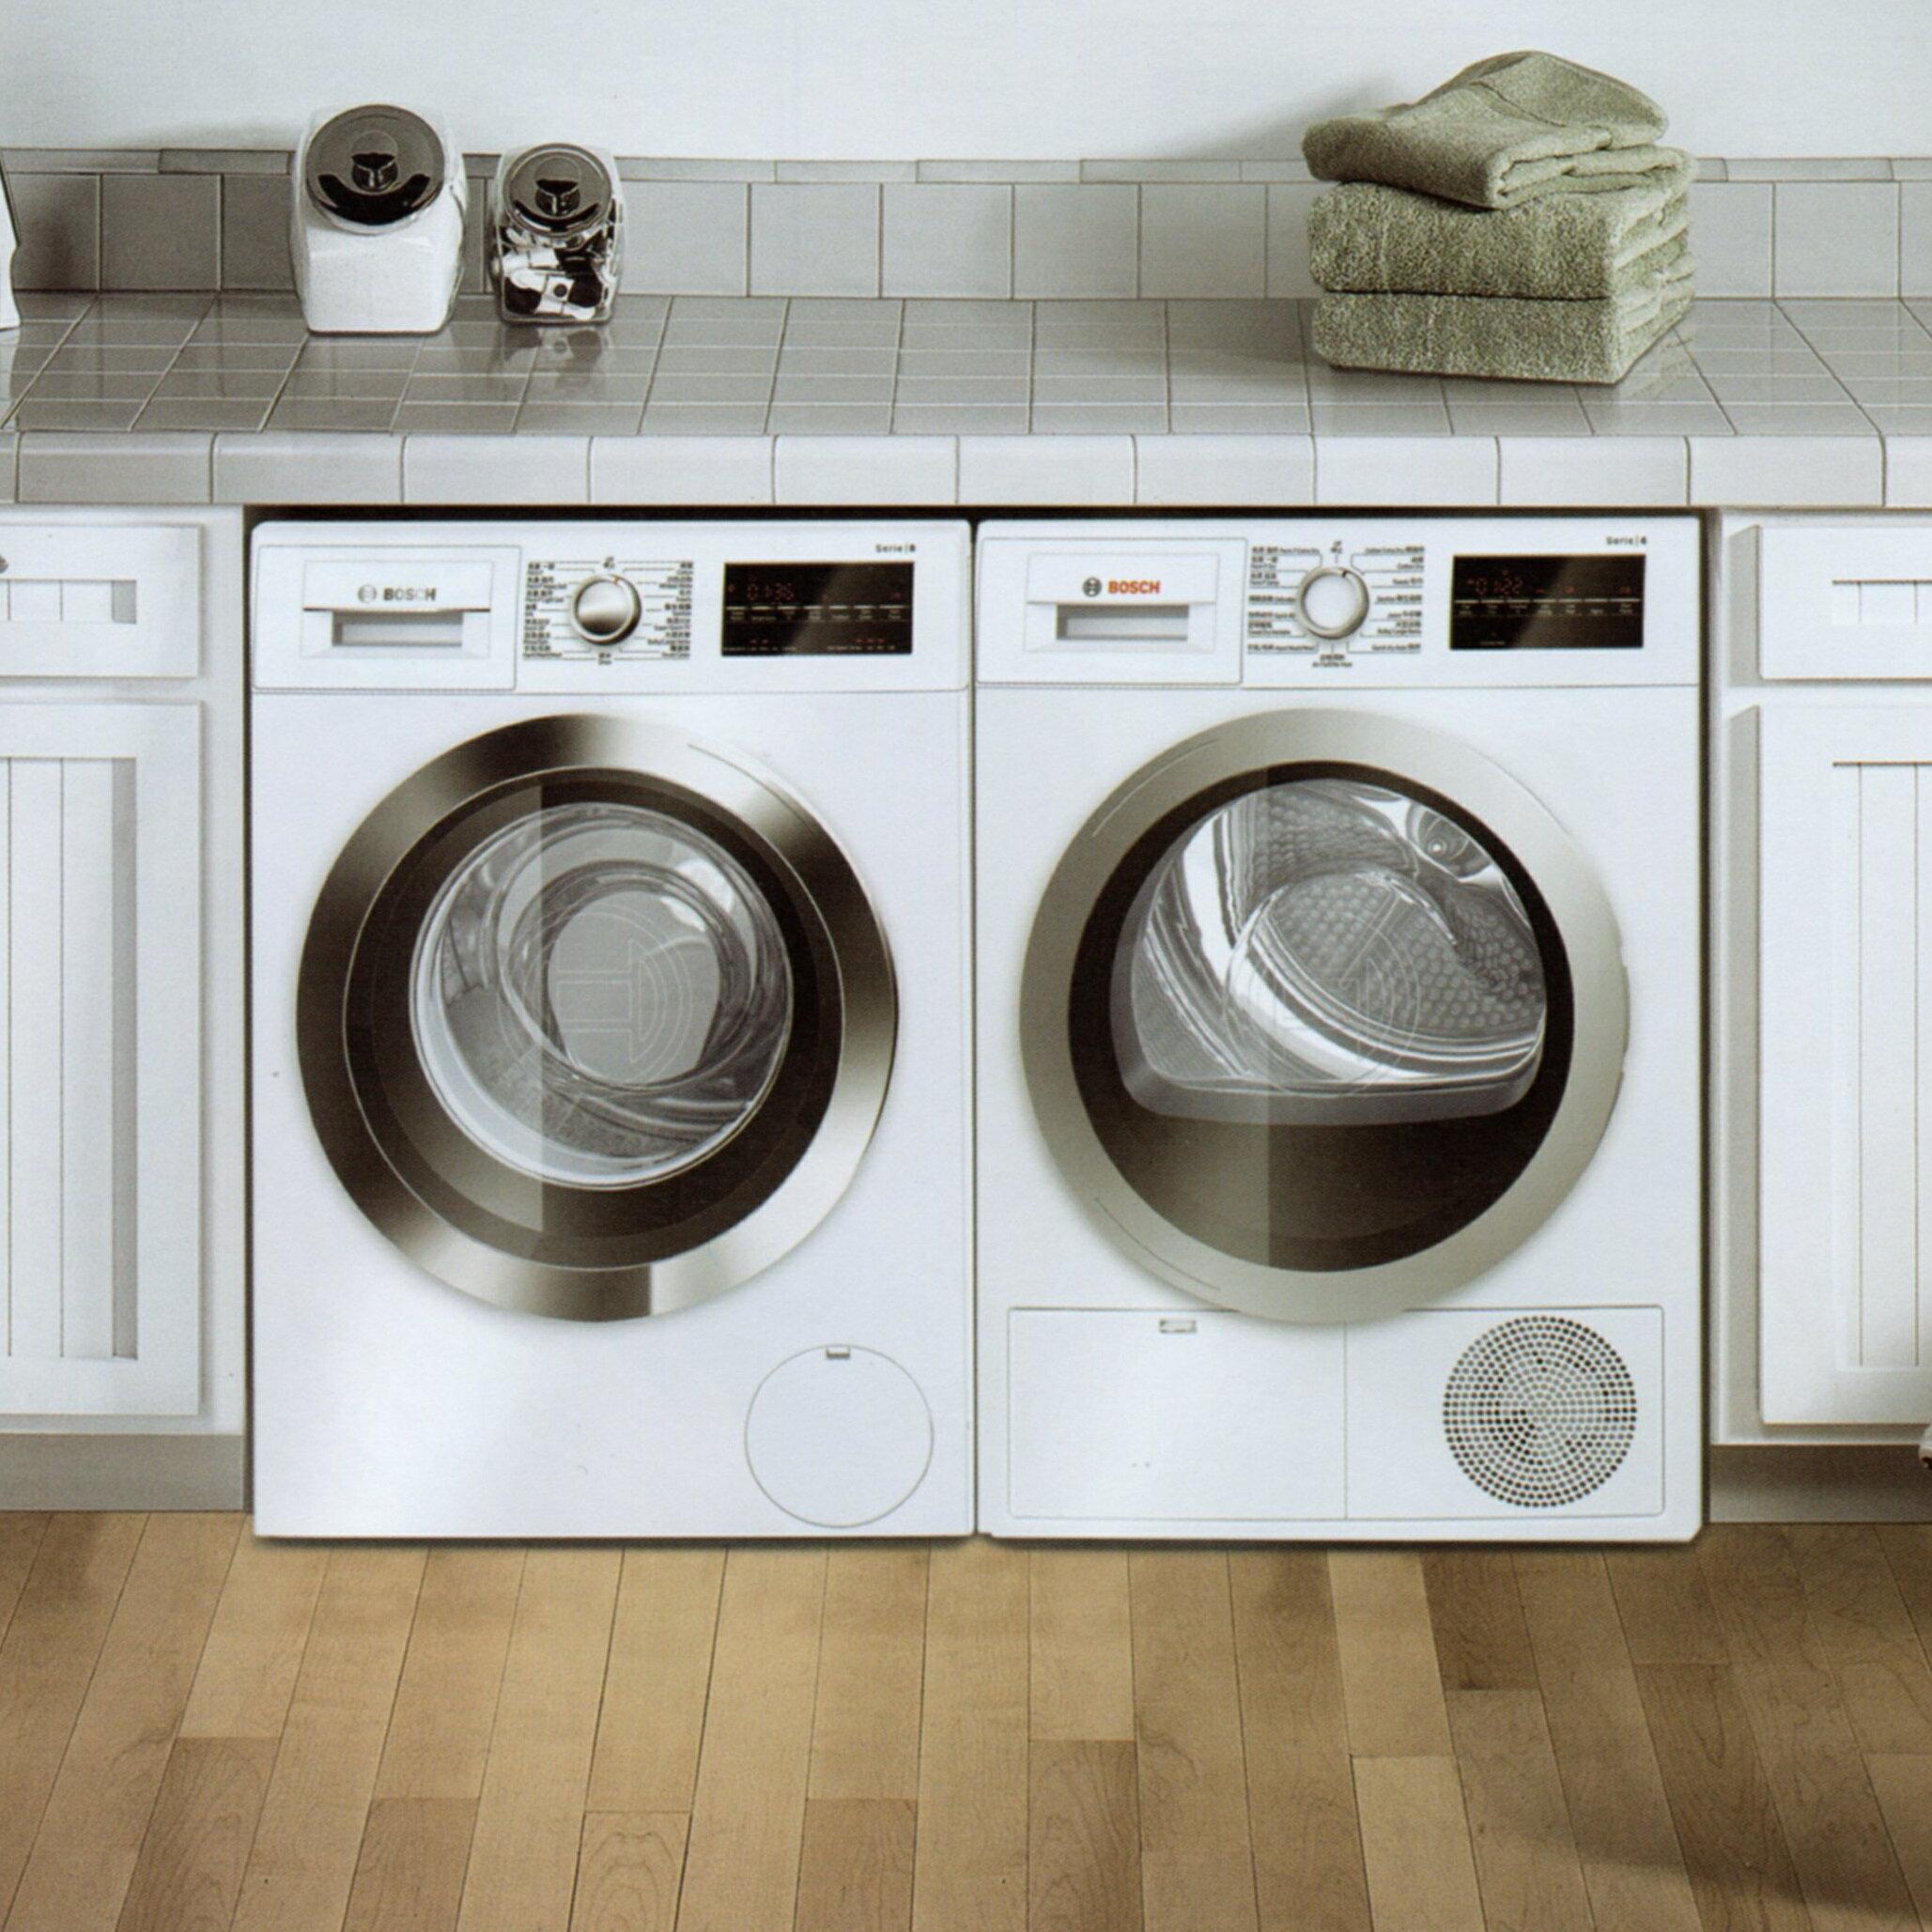 BOSCH 博世 滾筒洗衣機 WAT28402TC + WTG86401TC 冷凝式乾衣機※熱線 07-7428010